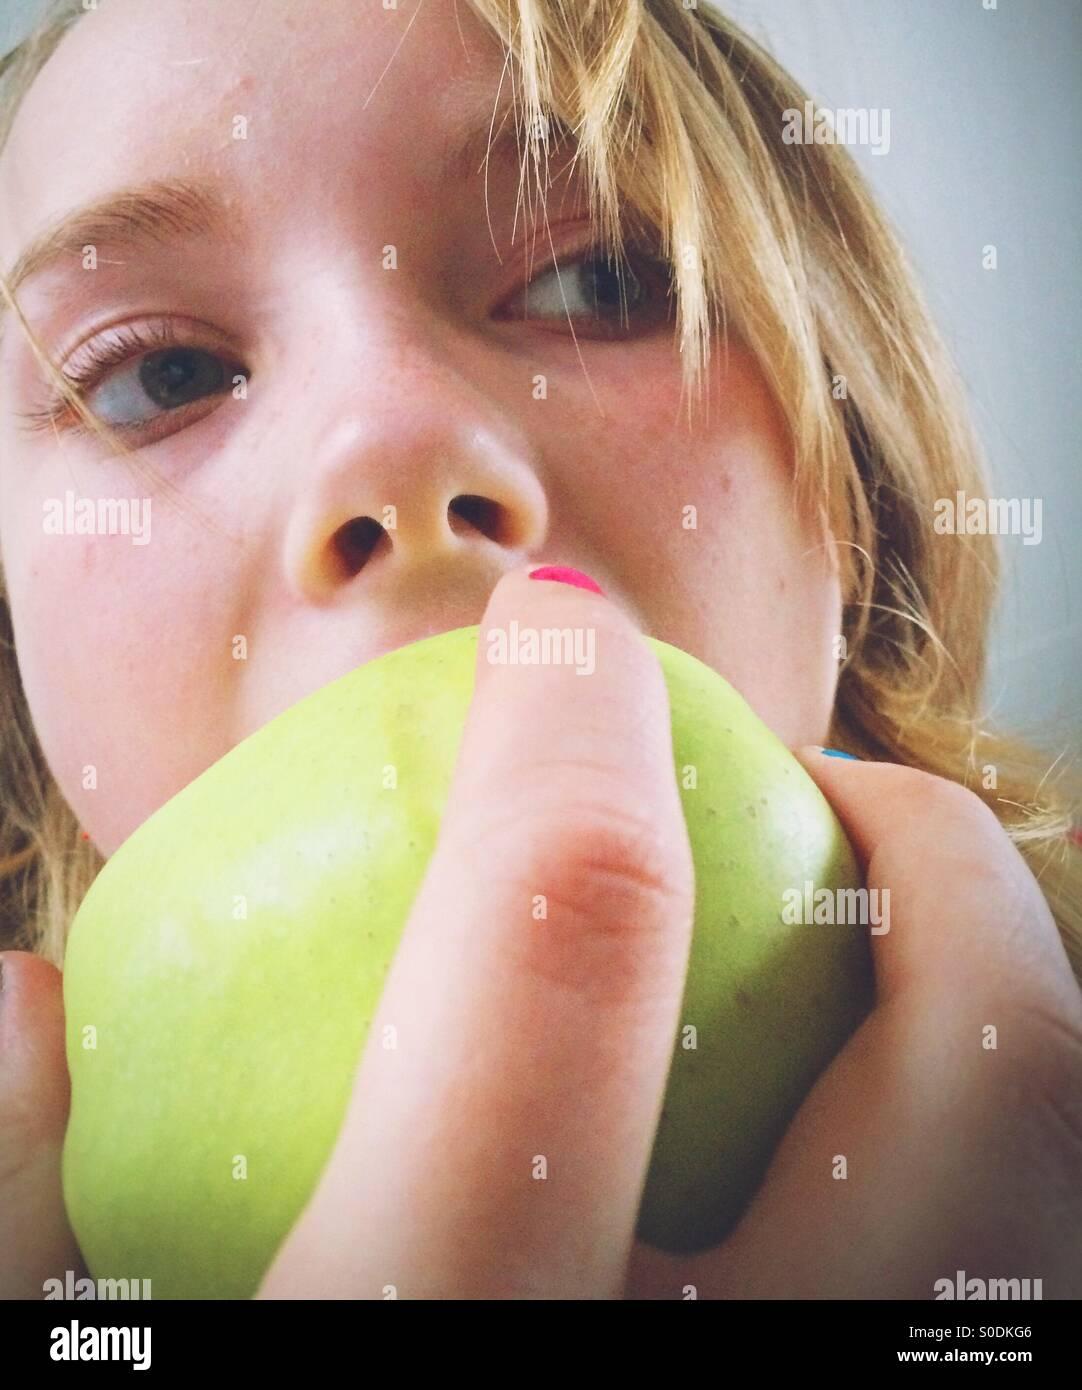 Comer manzana Foto de stock